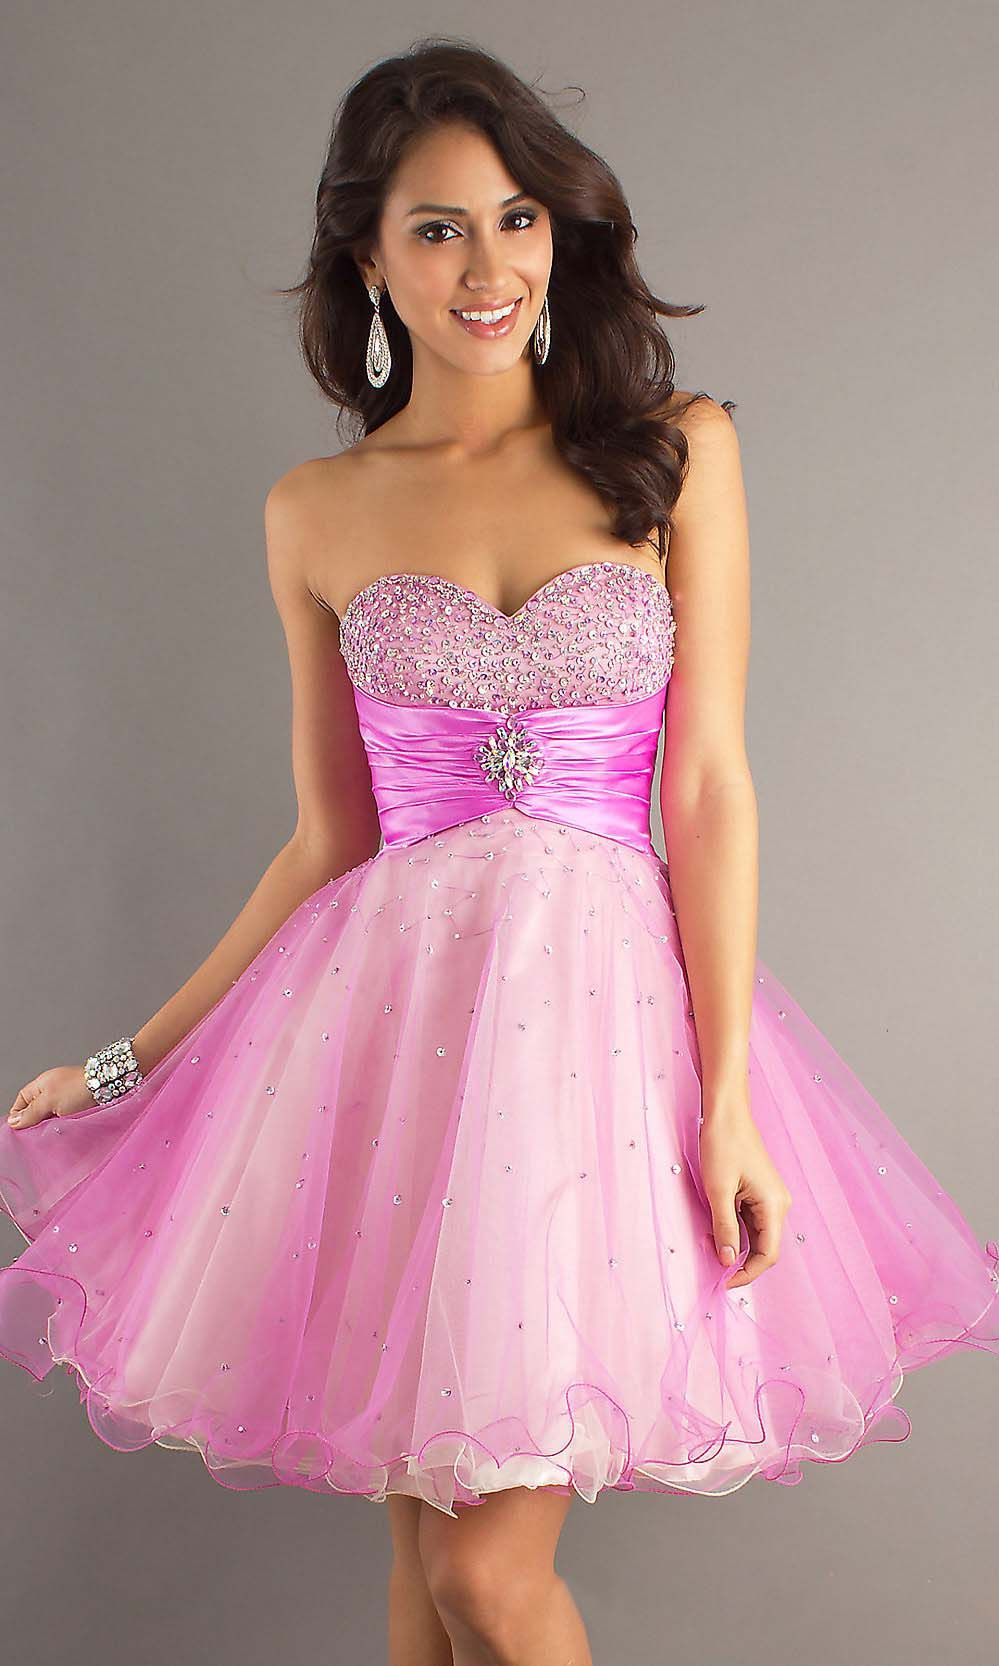 Formal dresses for juniors columbus ohio | dresses | Pinterest